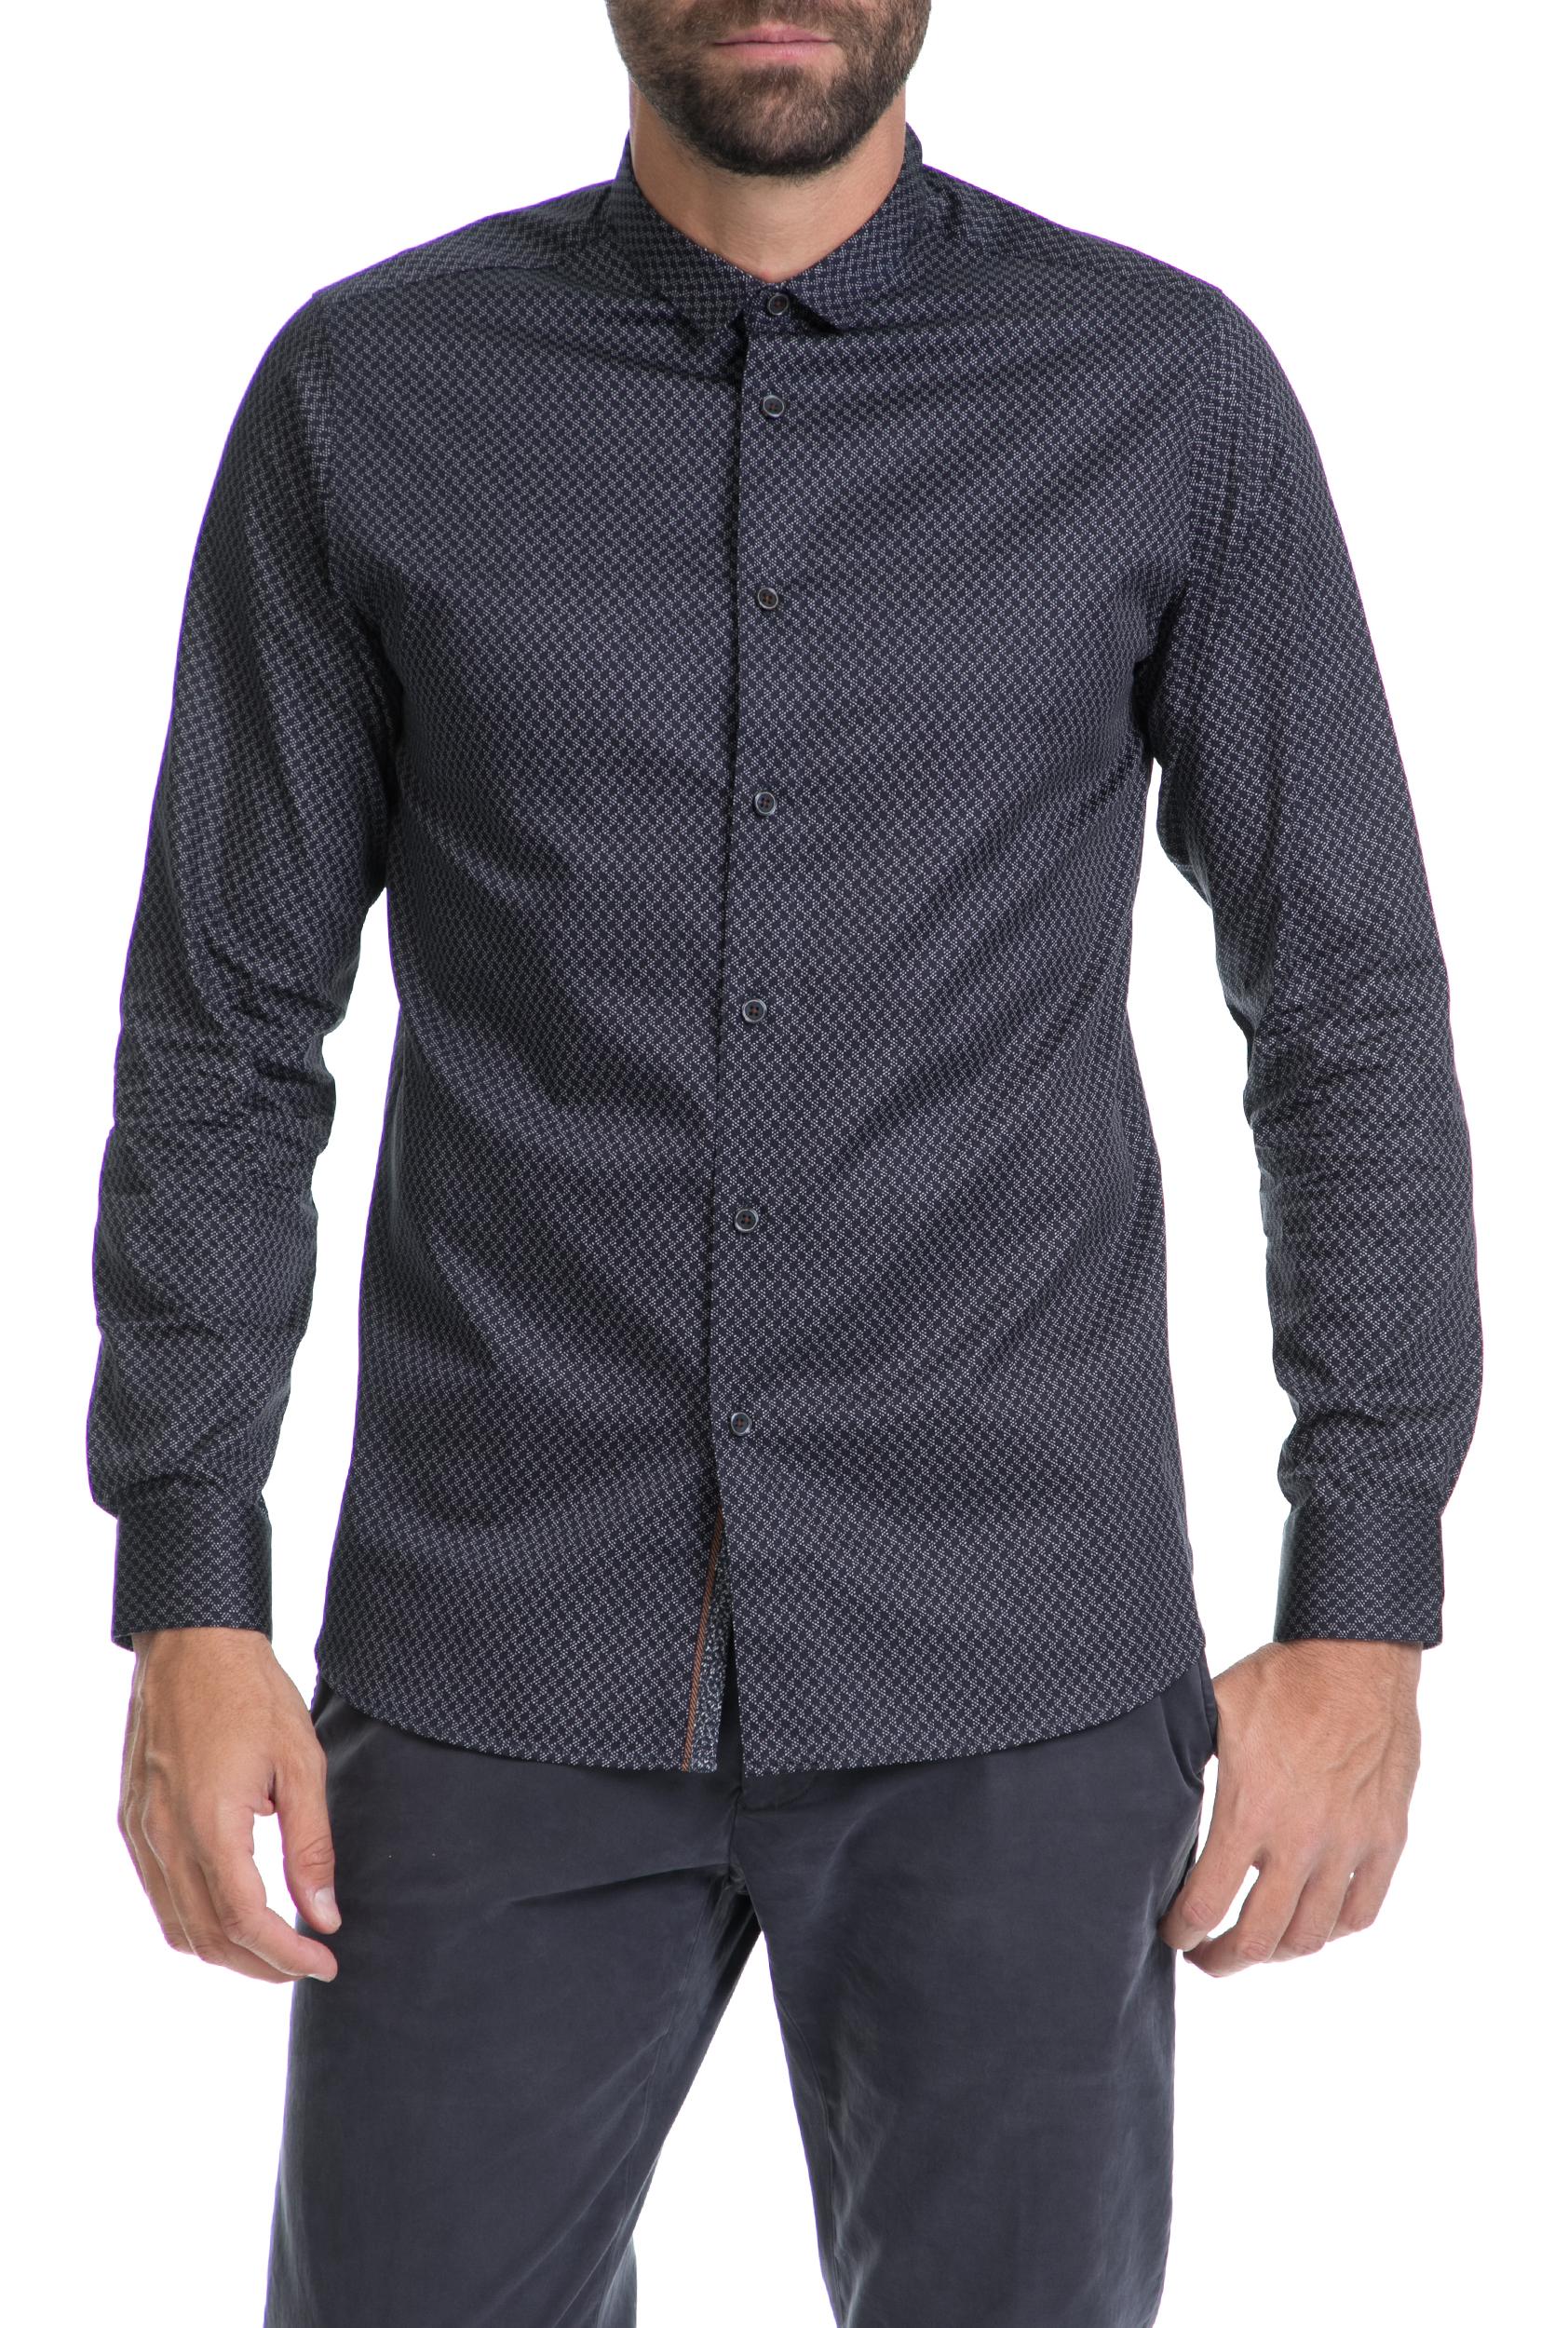 TED BAKER - Ανδρικό πουκάμισο SENNE LS GEO PRINT TED BAKER μπλε-γκρι ανδρικά ρούχα πουκάμισα μακρυμάνικα